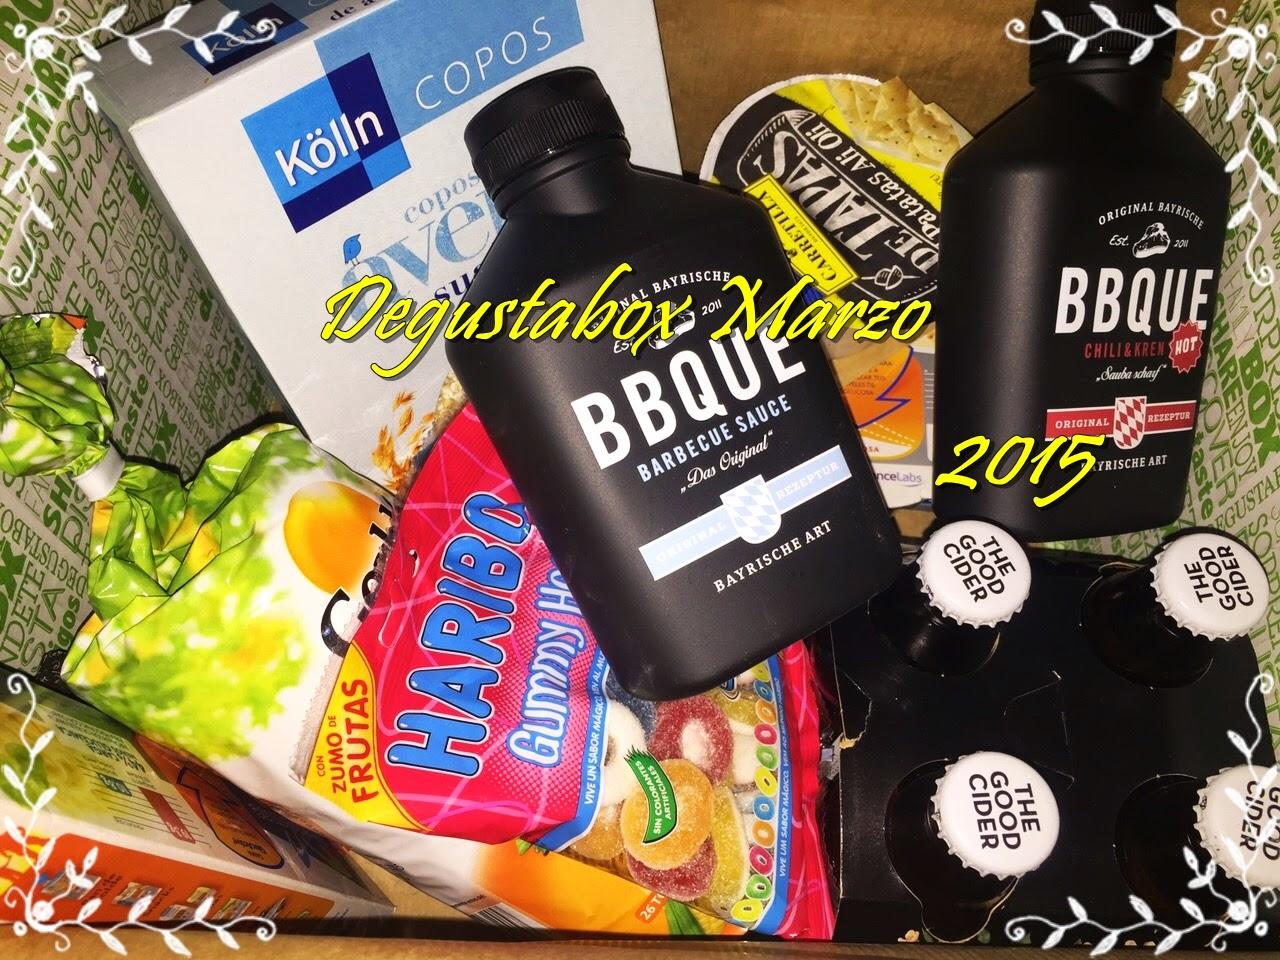 Degustabox Marzo 2015